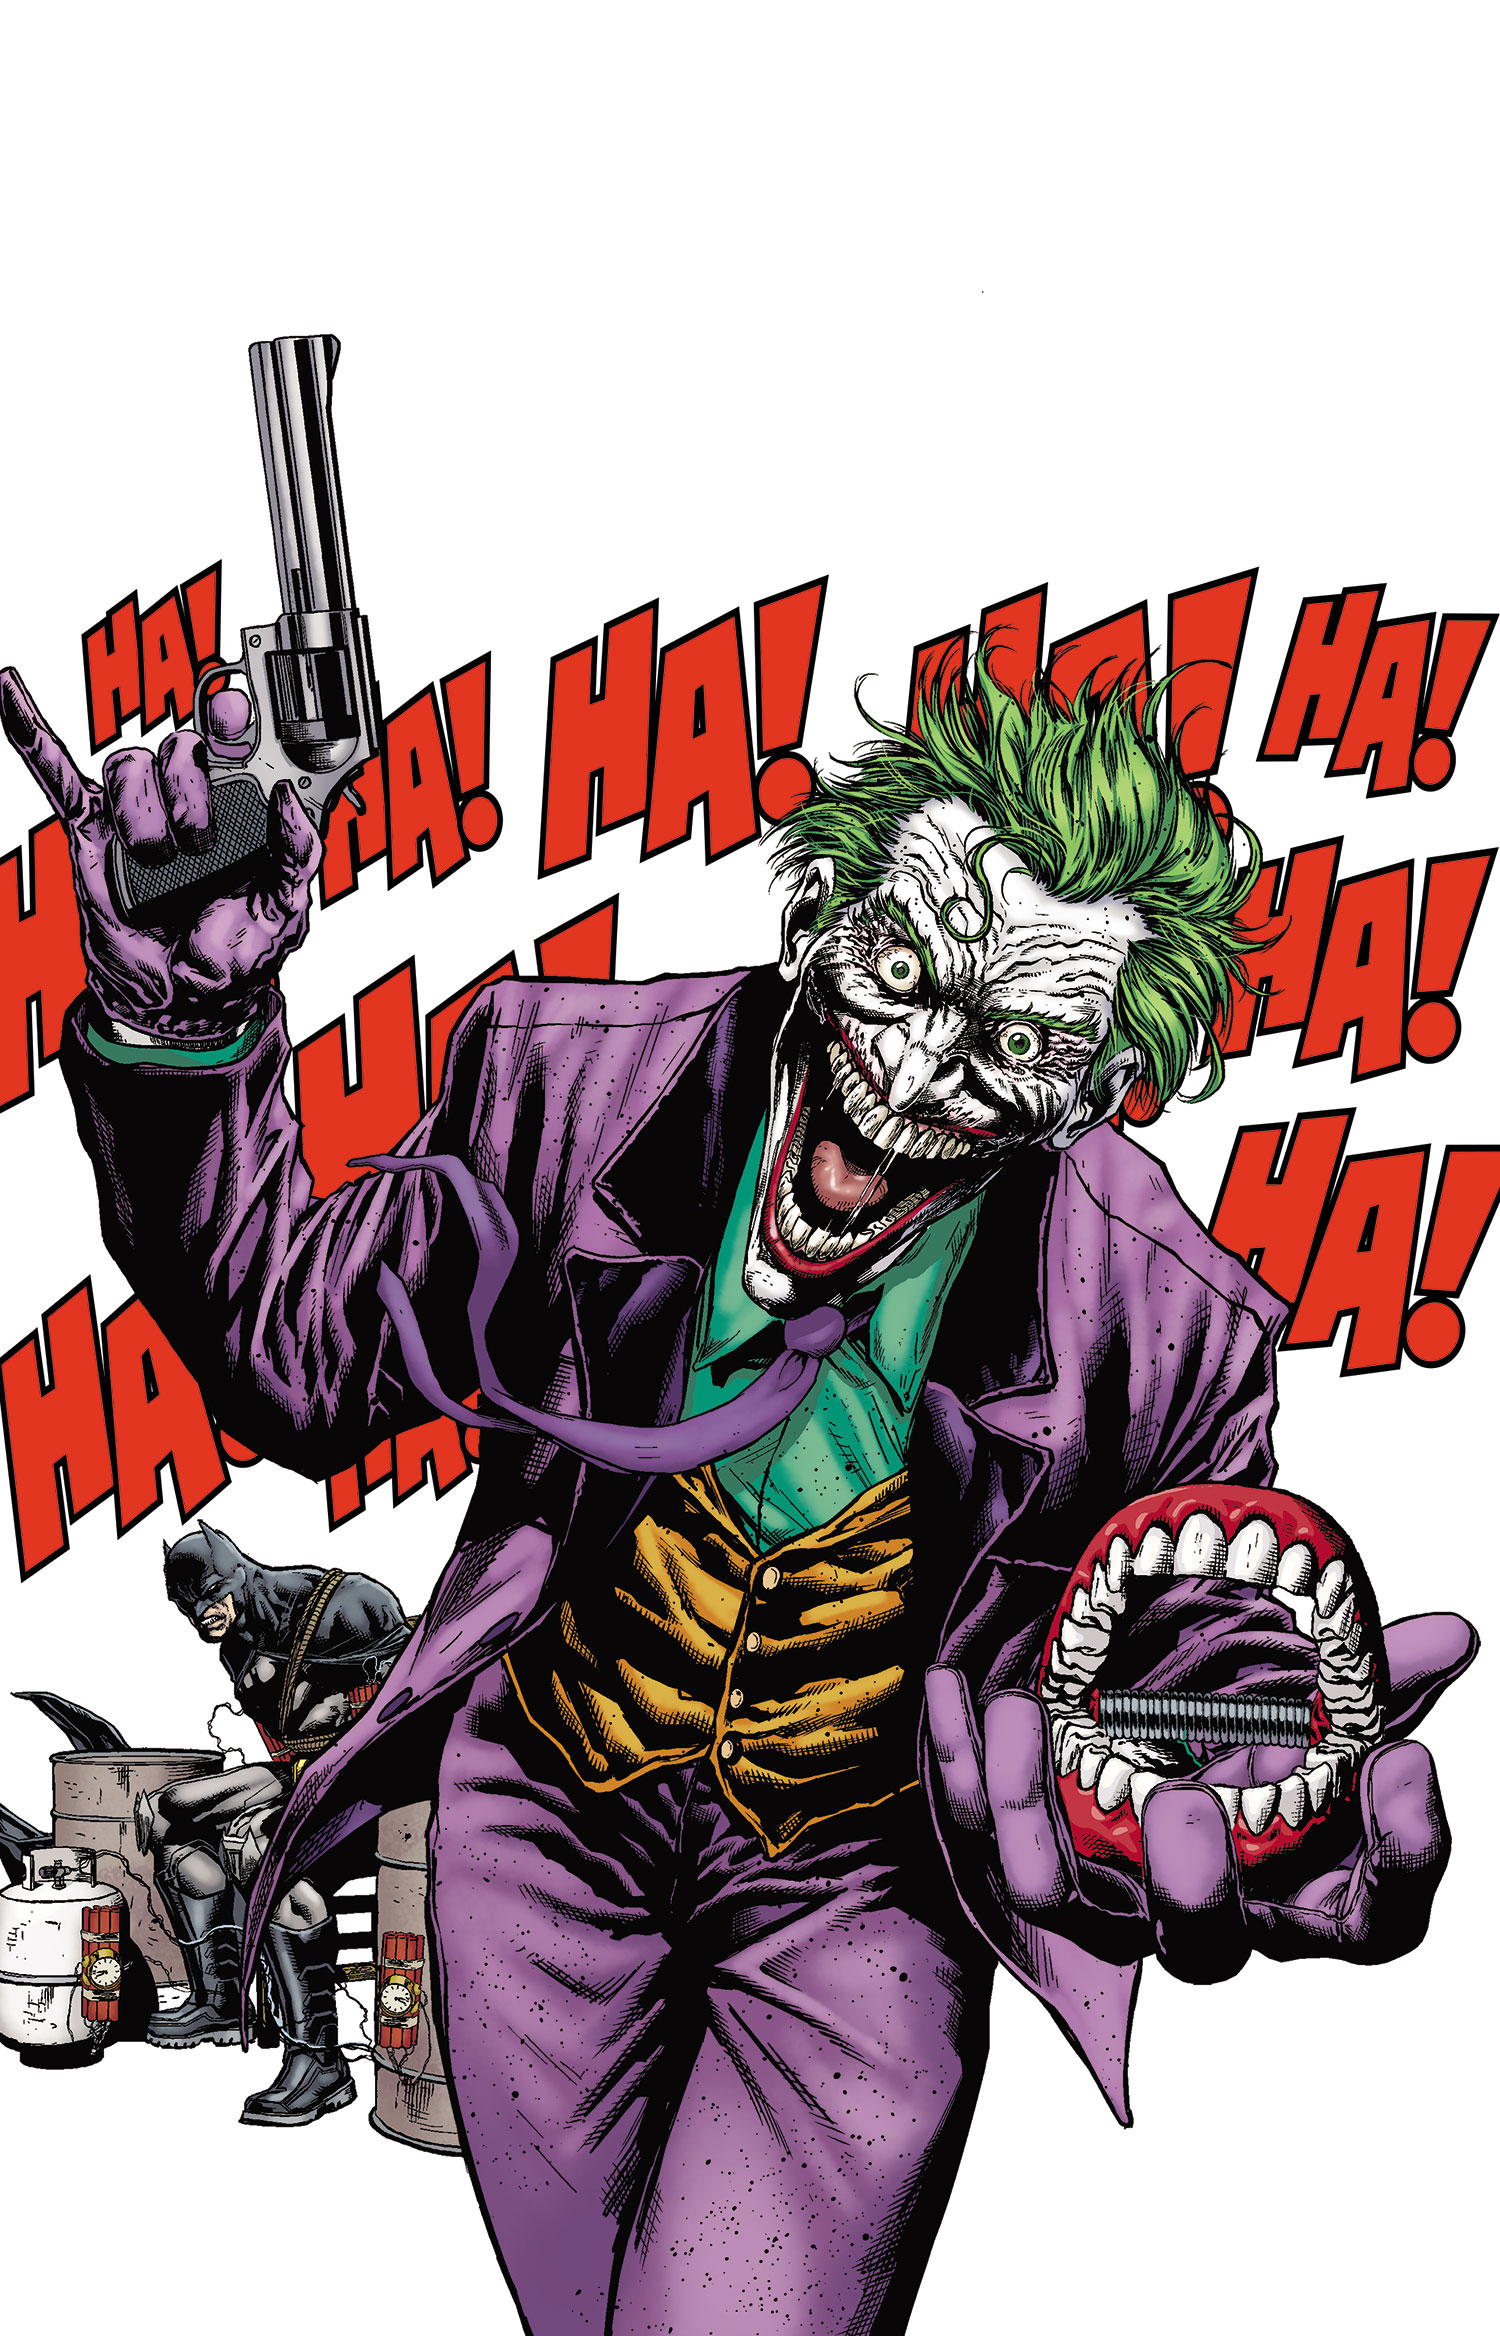 http://vignette2.wikia.nocookie.net/marvel_dc/images/4/41/Batman_Vol_2_23.1_The_Joker_Textless.jpg/revision/latest?cb=20130904201016